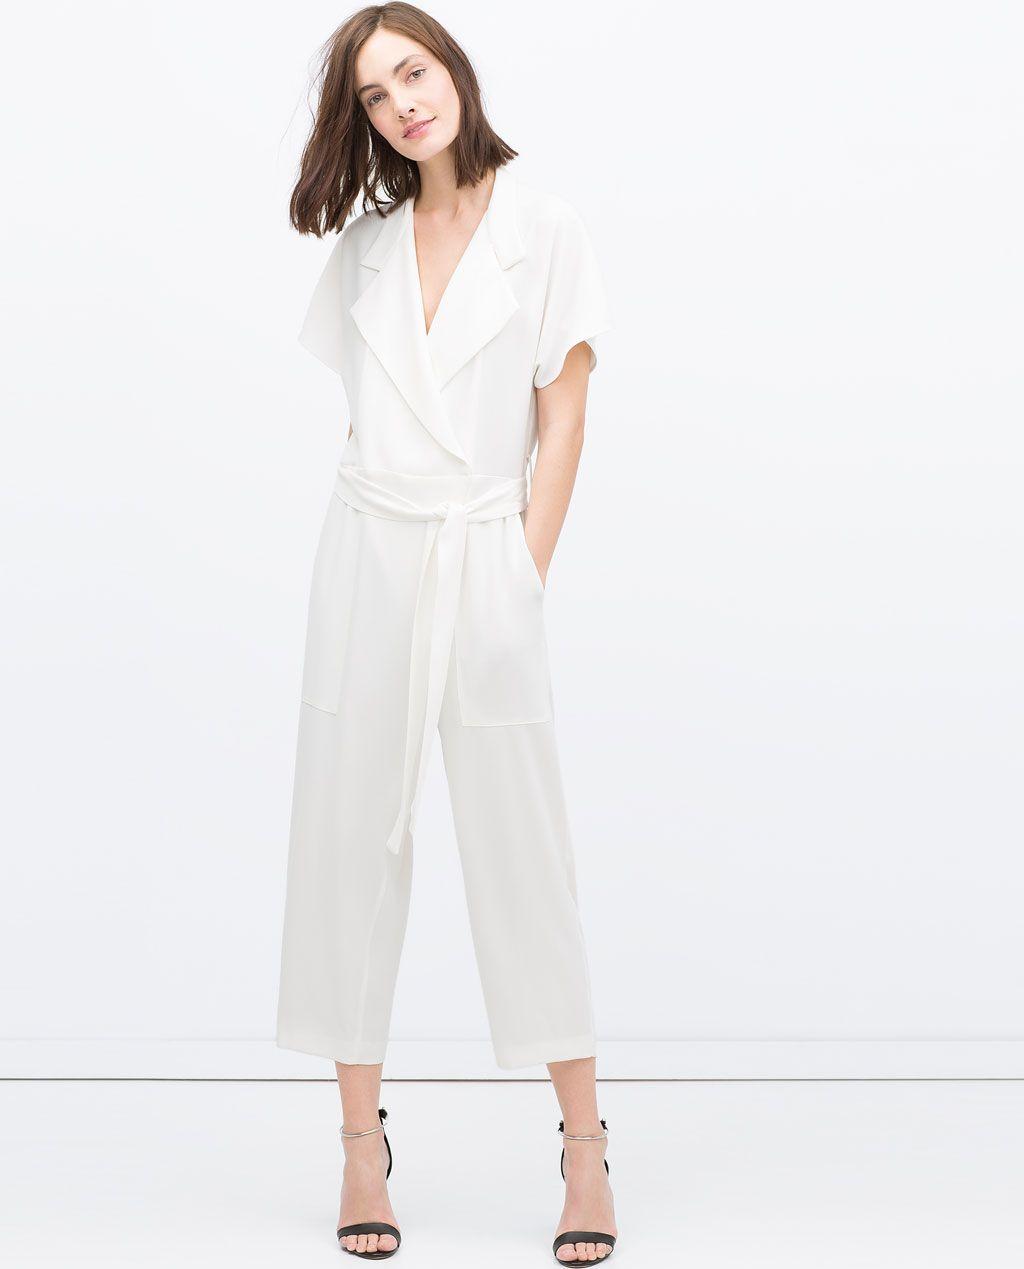 0a0aea530d ZARA - RAMADAN COLLECTION - LONG CROSSOVER JUMPSUIT | Fashion ...